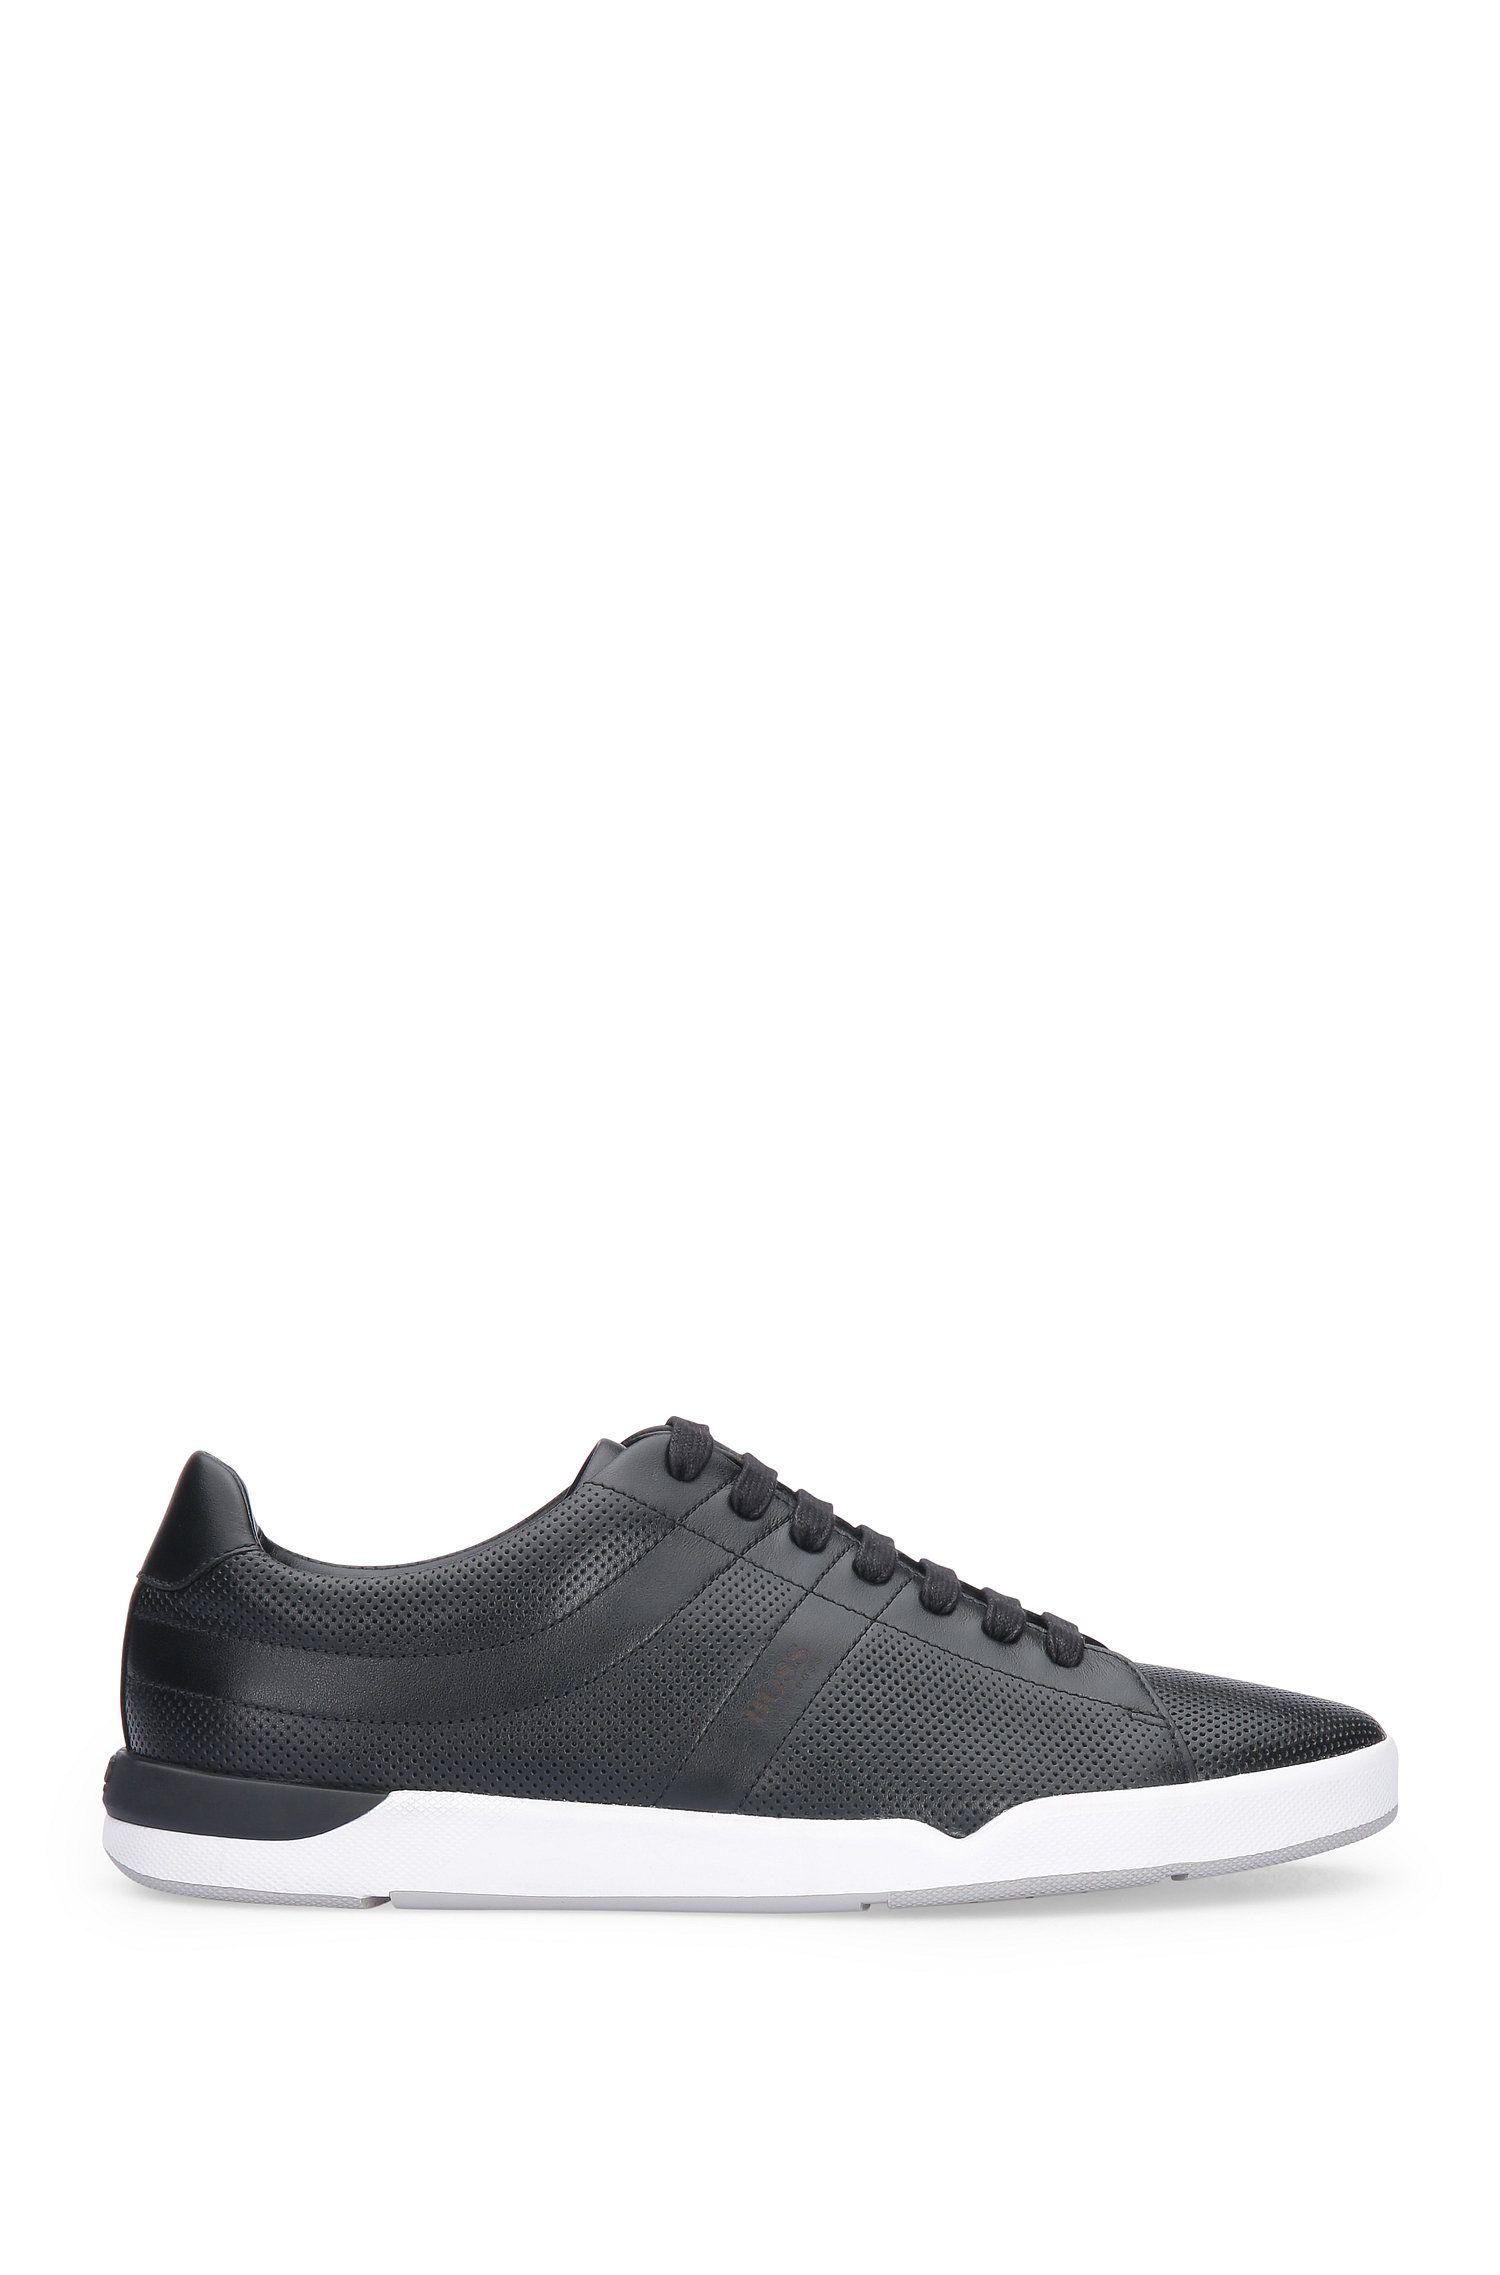 Leather Perforated Sneaker | Stillnes Tenn ltpf